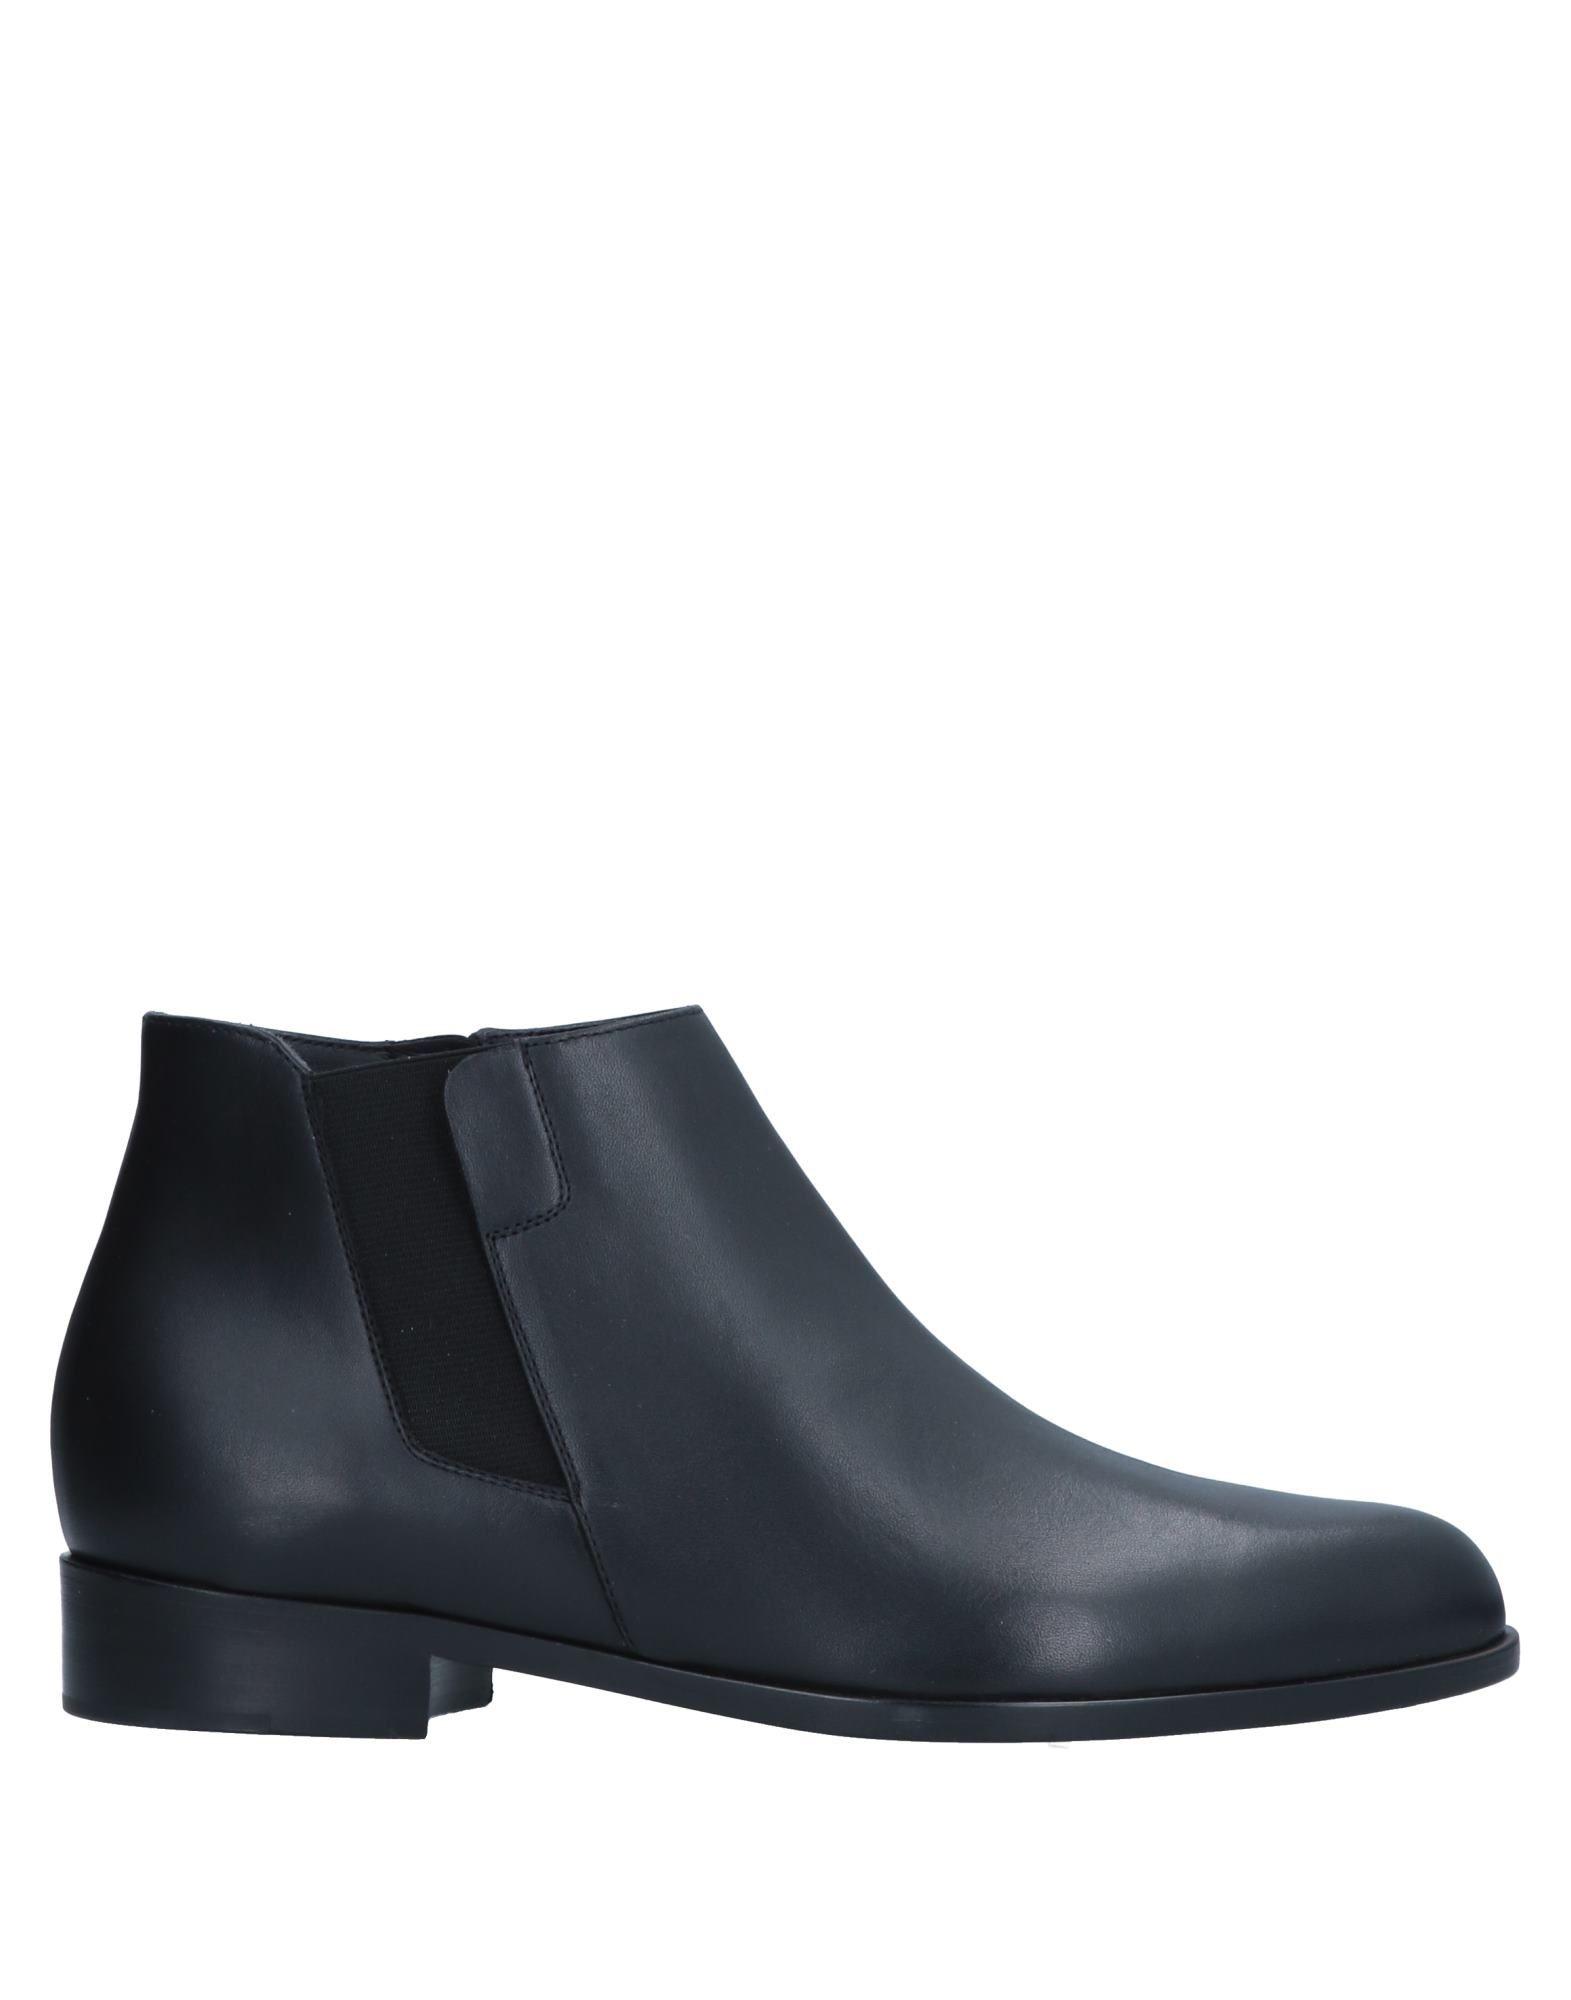 Giuseppe Zanotti Stiefelette Damen 11544699ELGünstige Schuhe gut aussehende Schuhe 11544699ELGünstige 3e2ad2